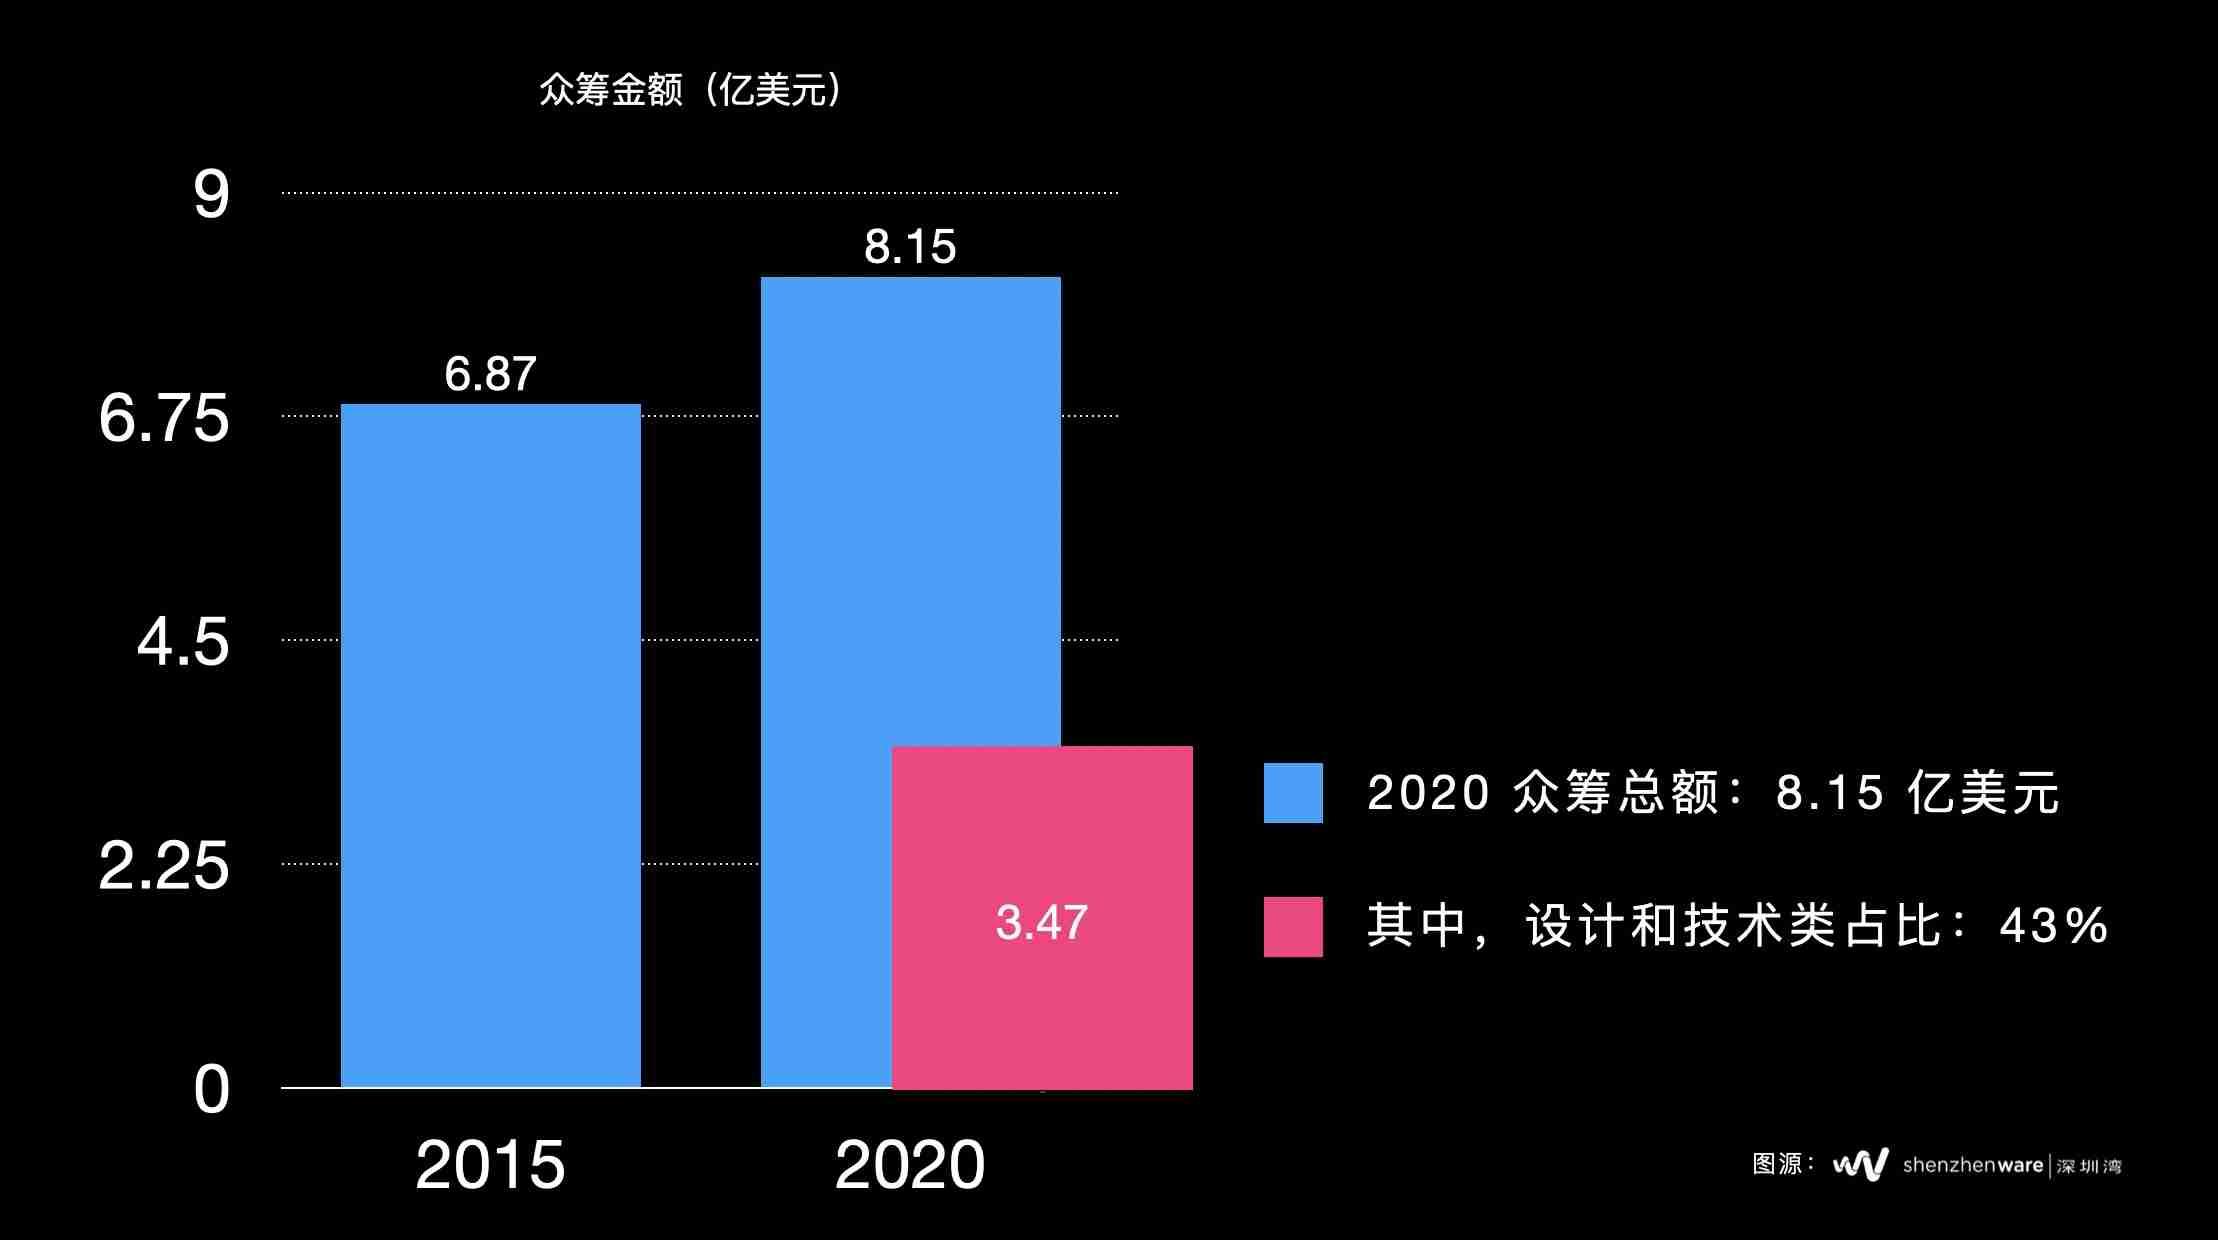 2020_KS_%E4%BC%97%E7%AD%B9%E9%87%91%E9%A2%9D%E6%A6%82%E8%A7%88